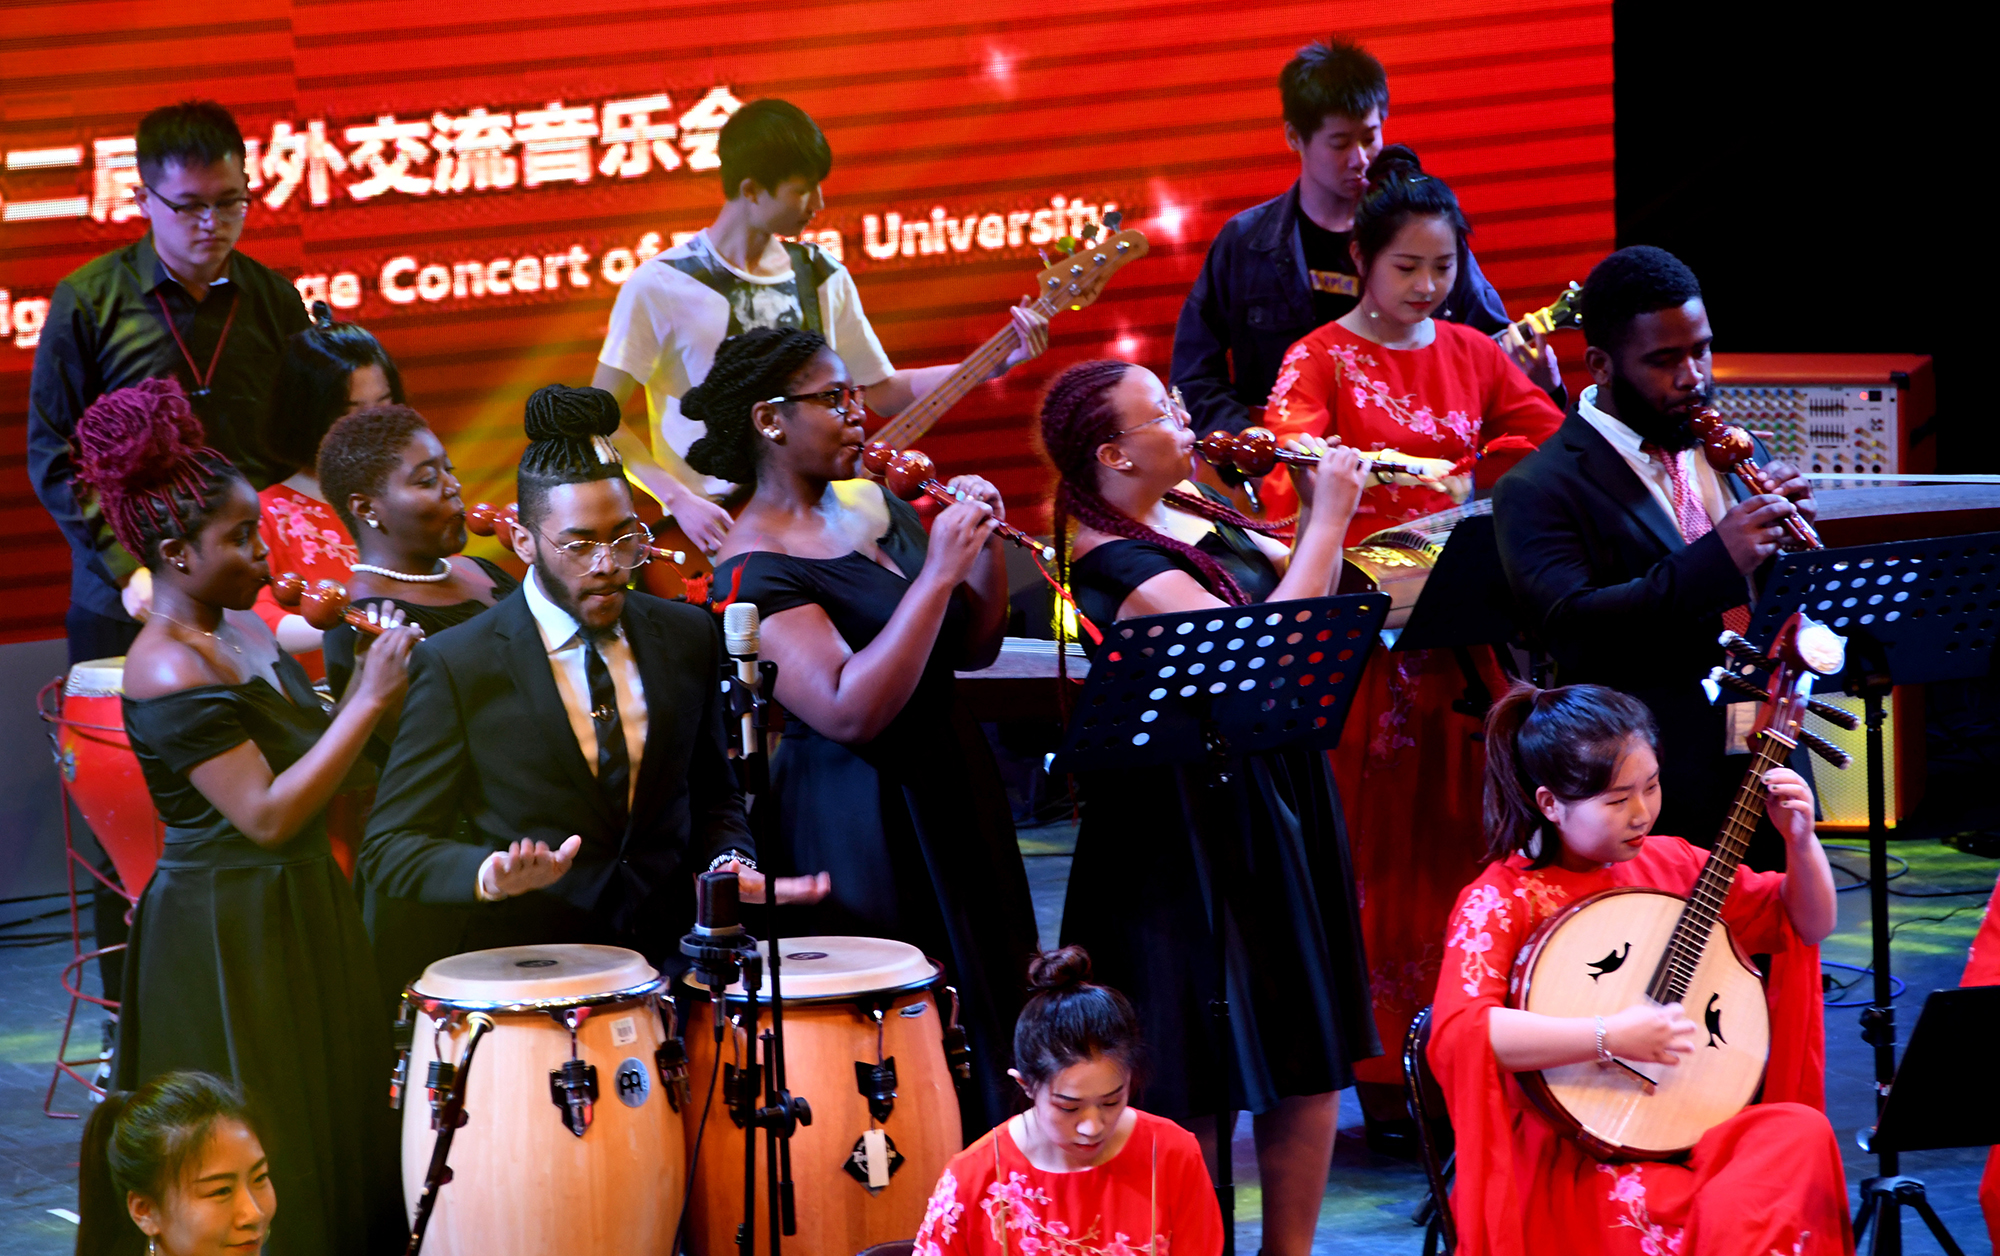 From left, DSU students Ashlyn Moore, Kiyah Mewborn, Darrell Miller, Jevana Lambert, Shaé Ross and Manuel Scott perform.